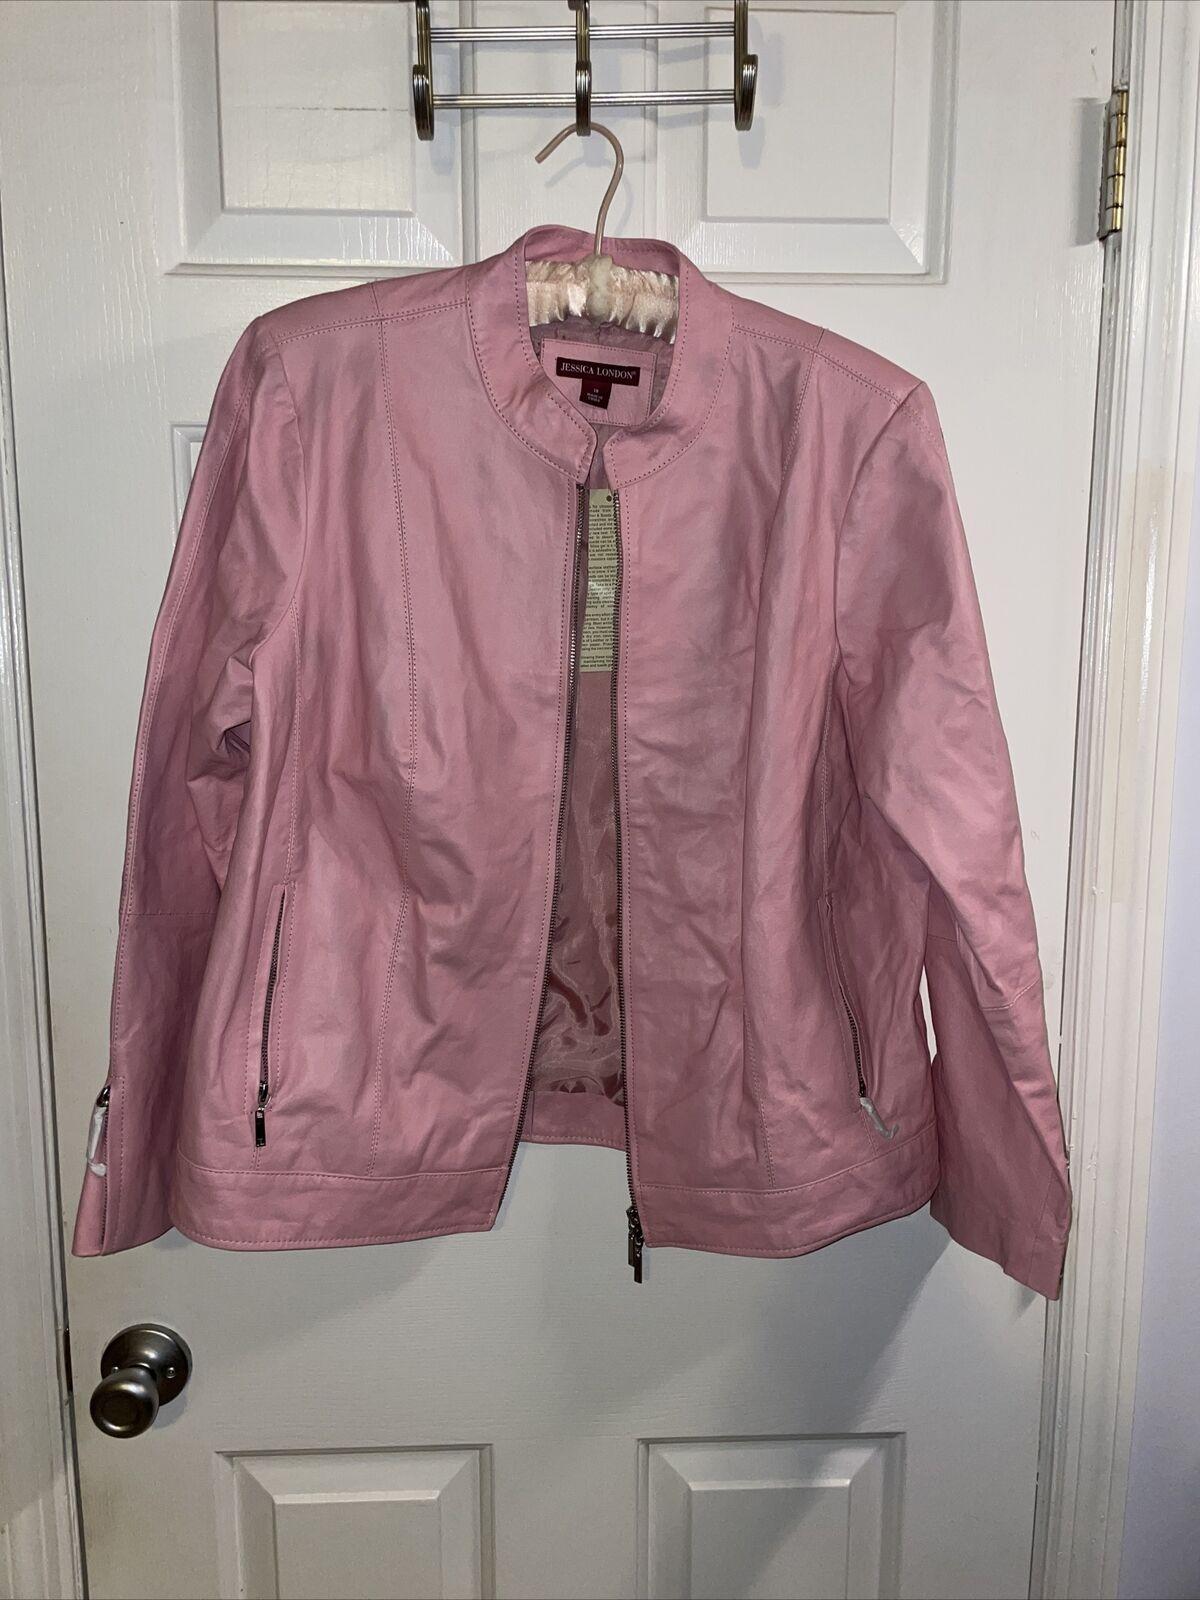 Leather jacket coat by Jessica London Pink sz 18 w l/xl pockets zip